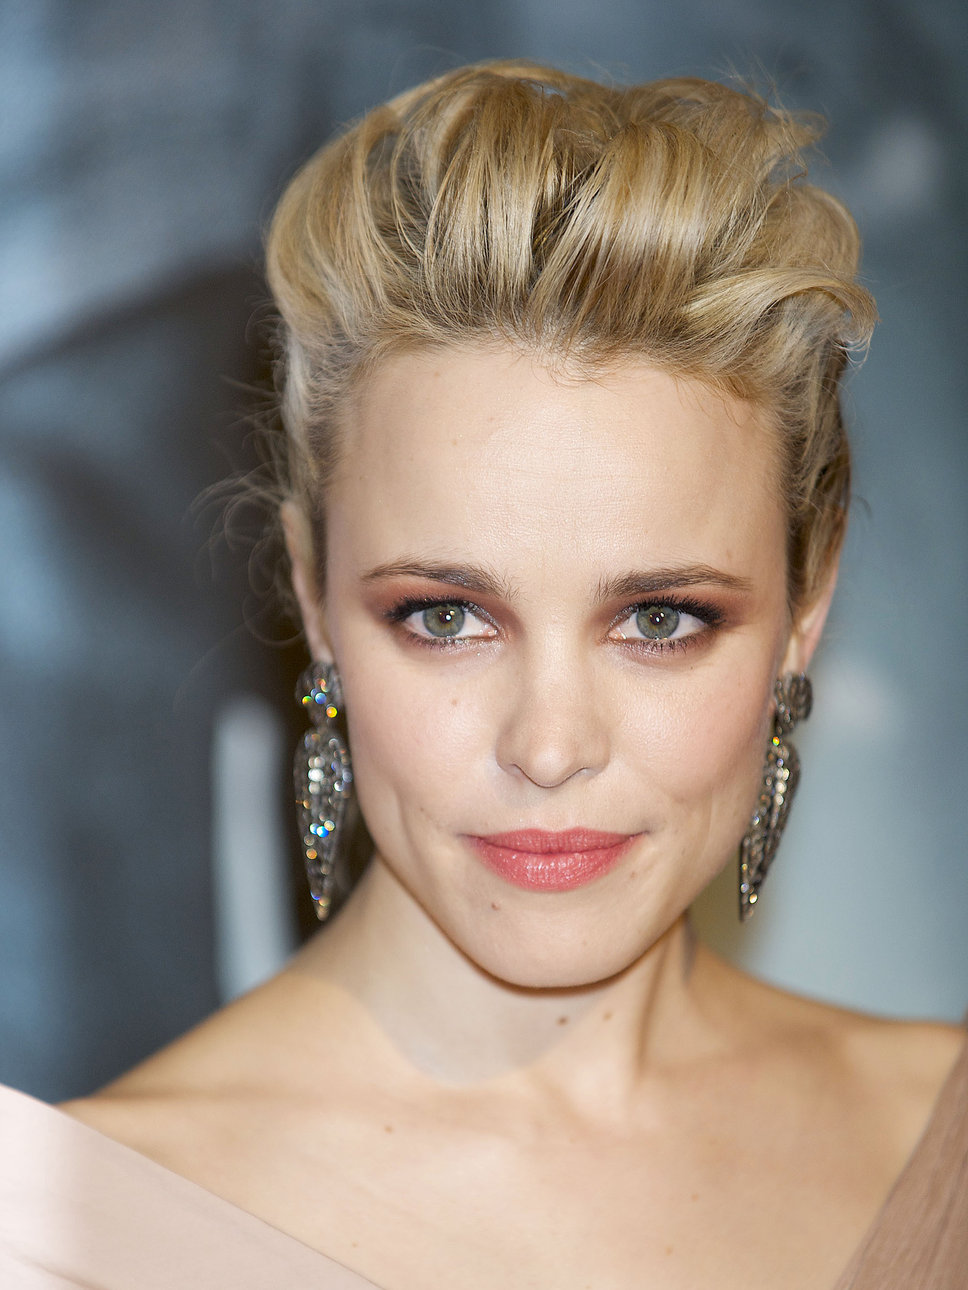 Hairstyles Popular 2012 Celebrity Rachel Mcadams